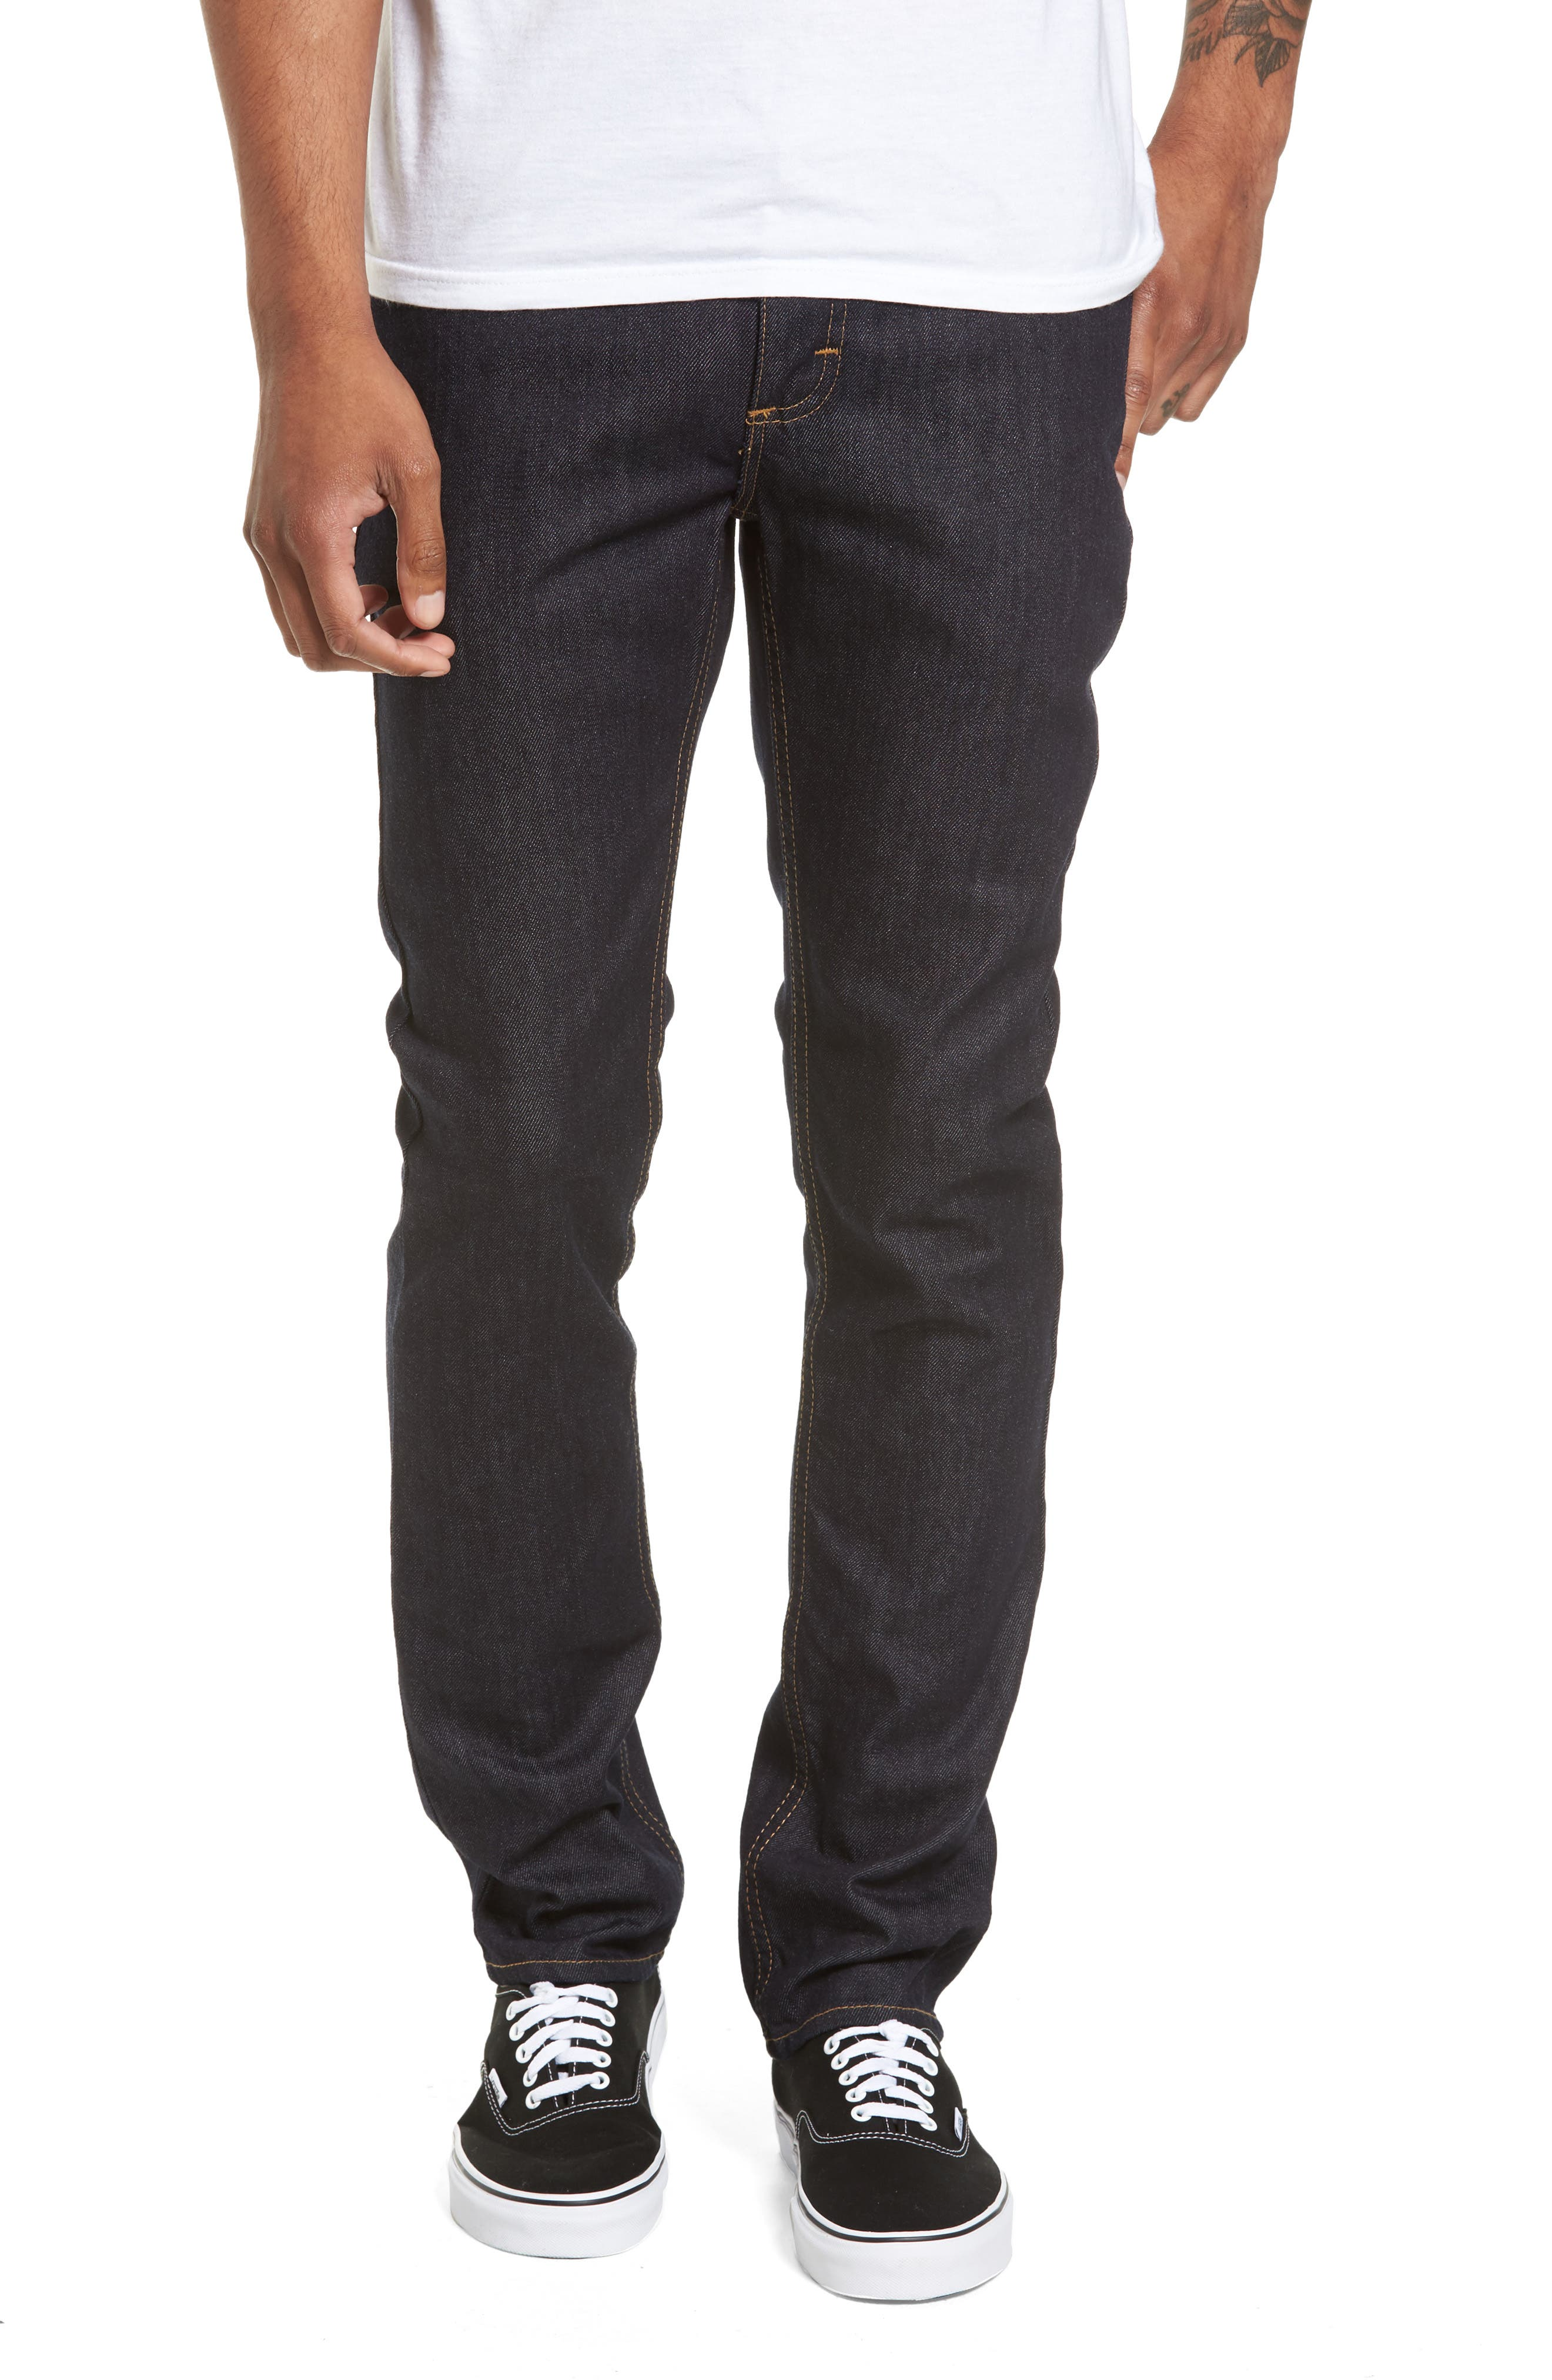 V76 Skinny Jeans,                             Main thumbnail 1, color,                             Indigo